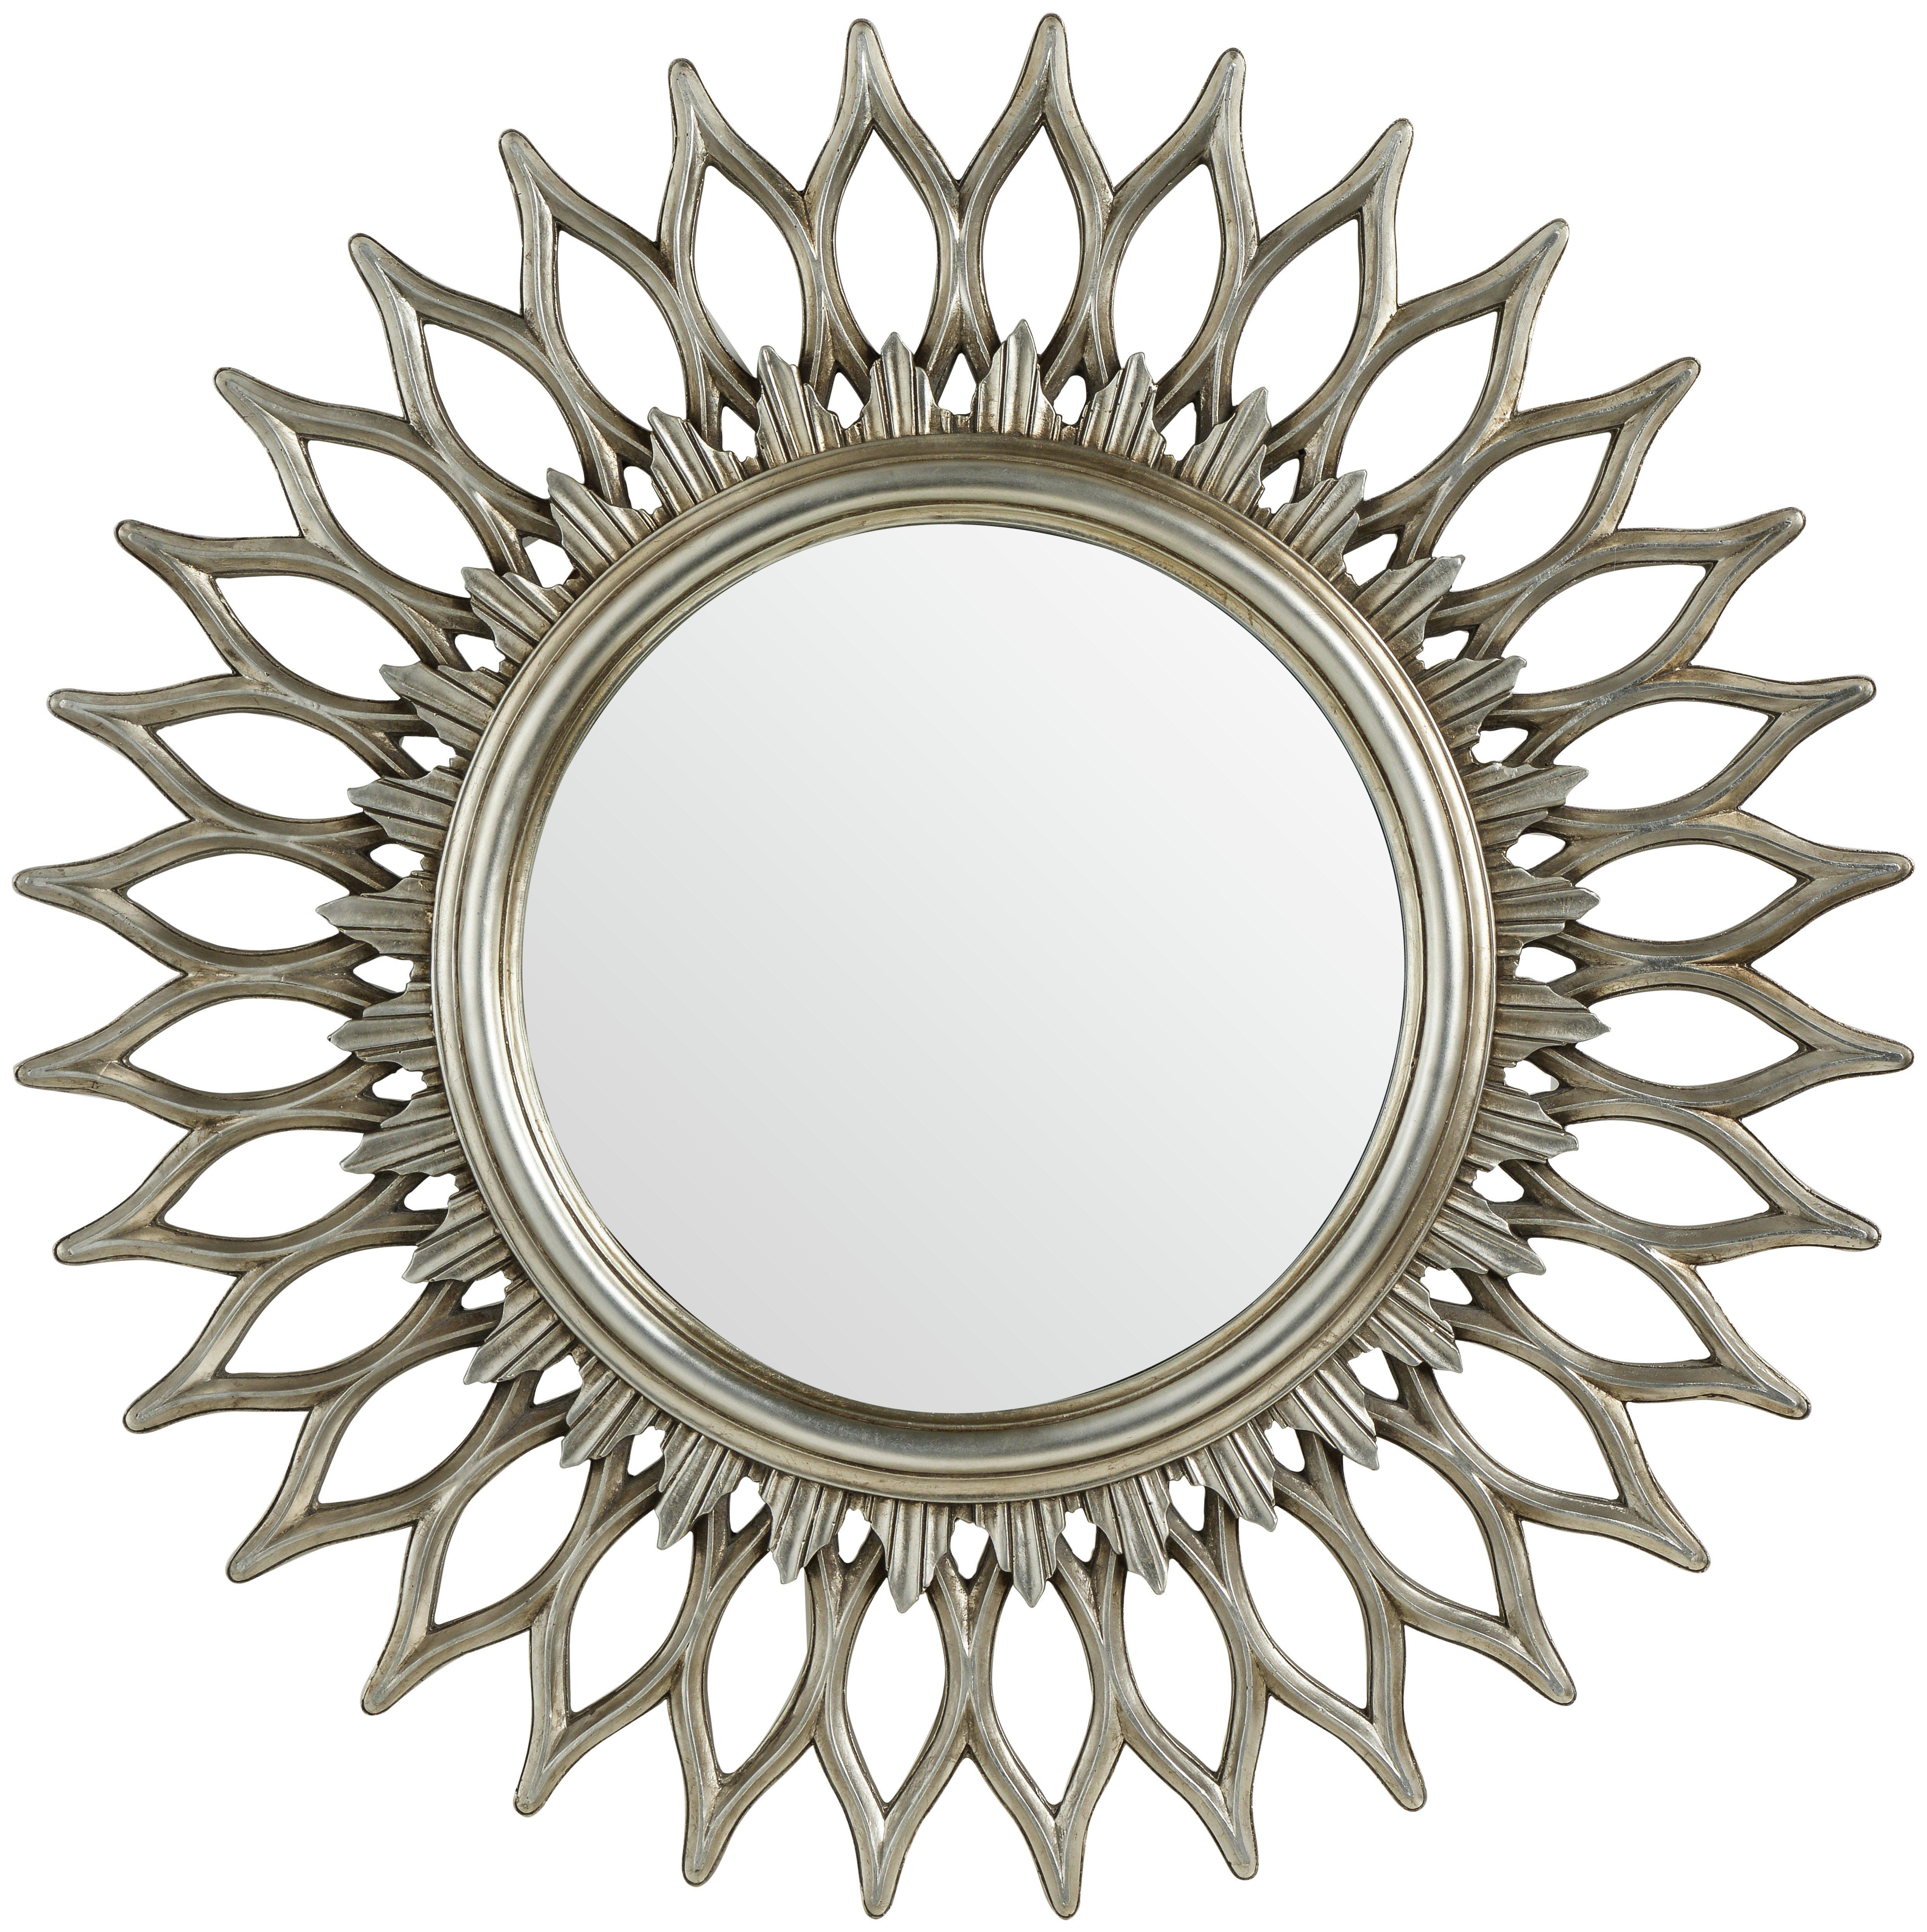 Premier Housewares Styro Round Wall Mirror - Champagne